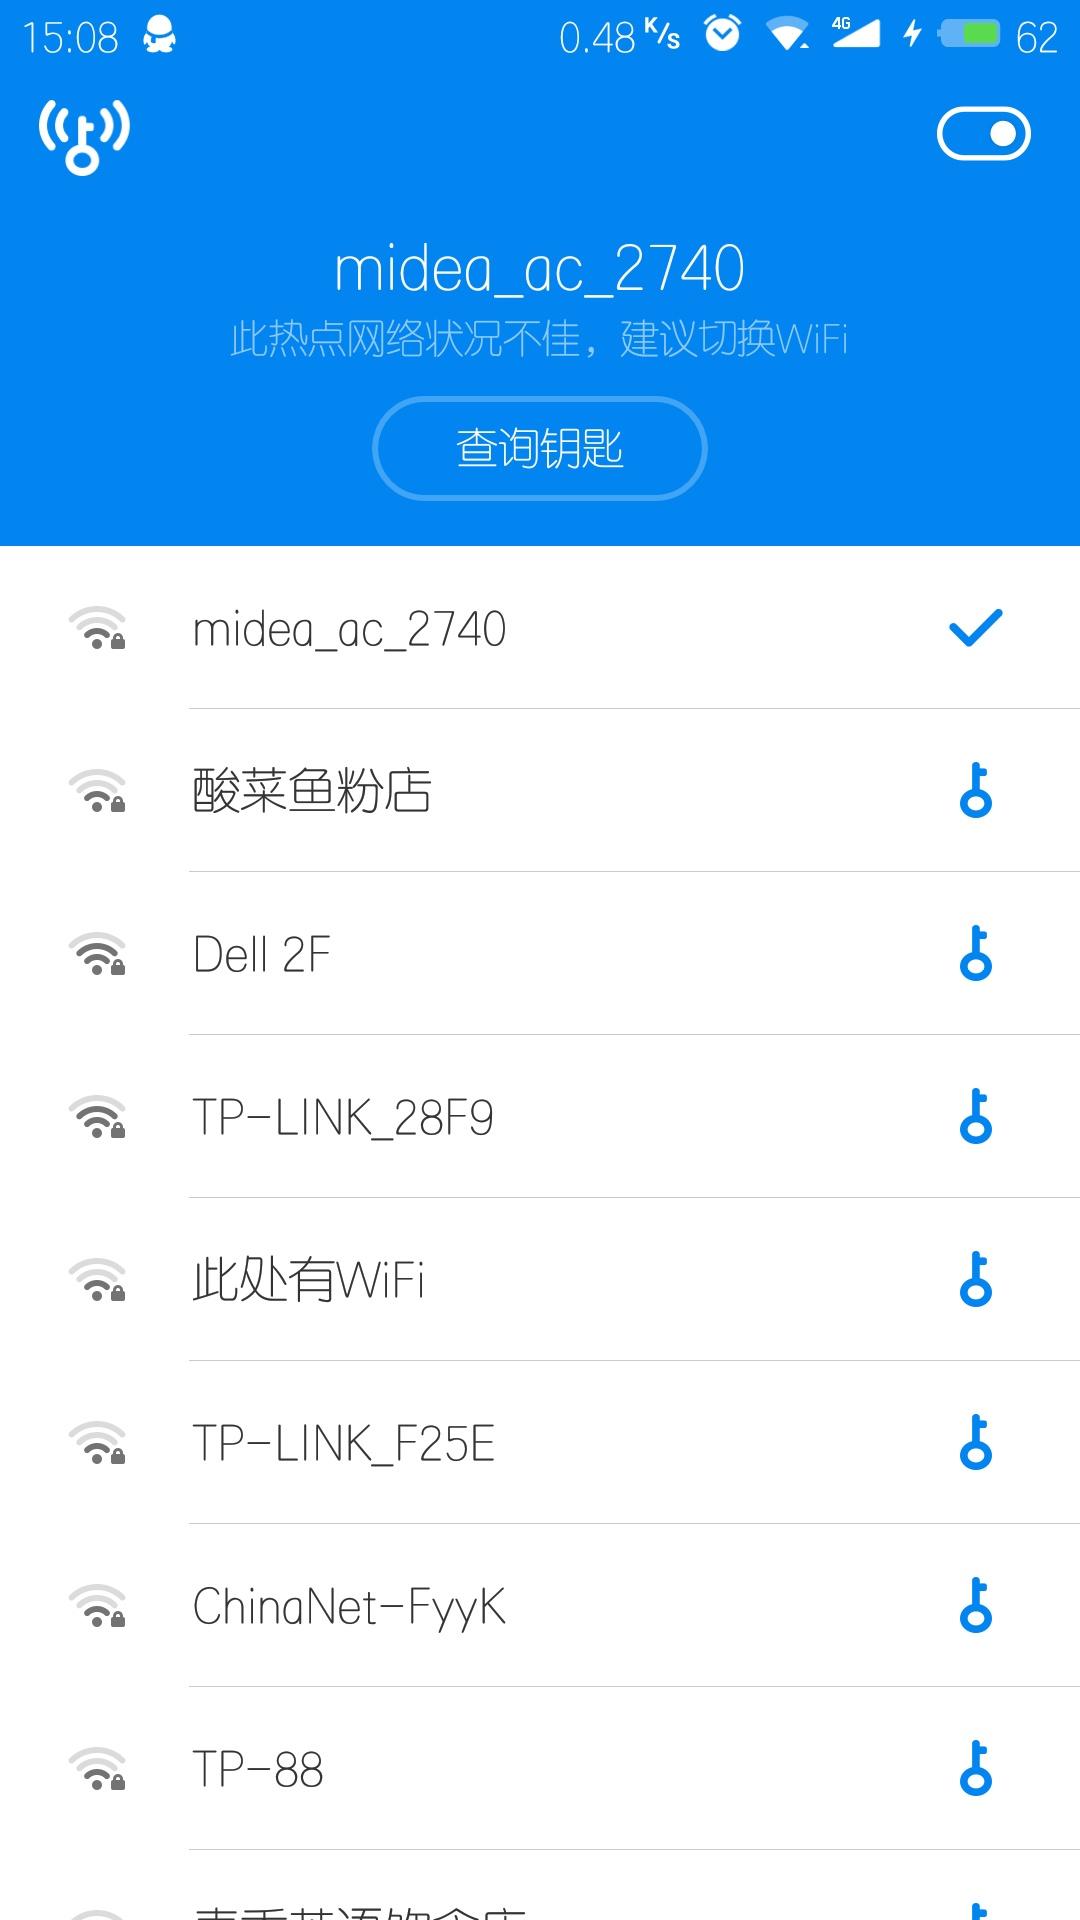 【2018-10-17】Wifi万能钥匙 v4.3.02 显密码清爽版 By:清羽